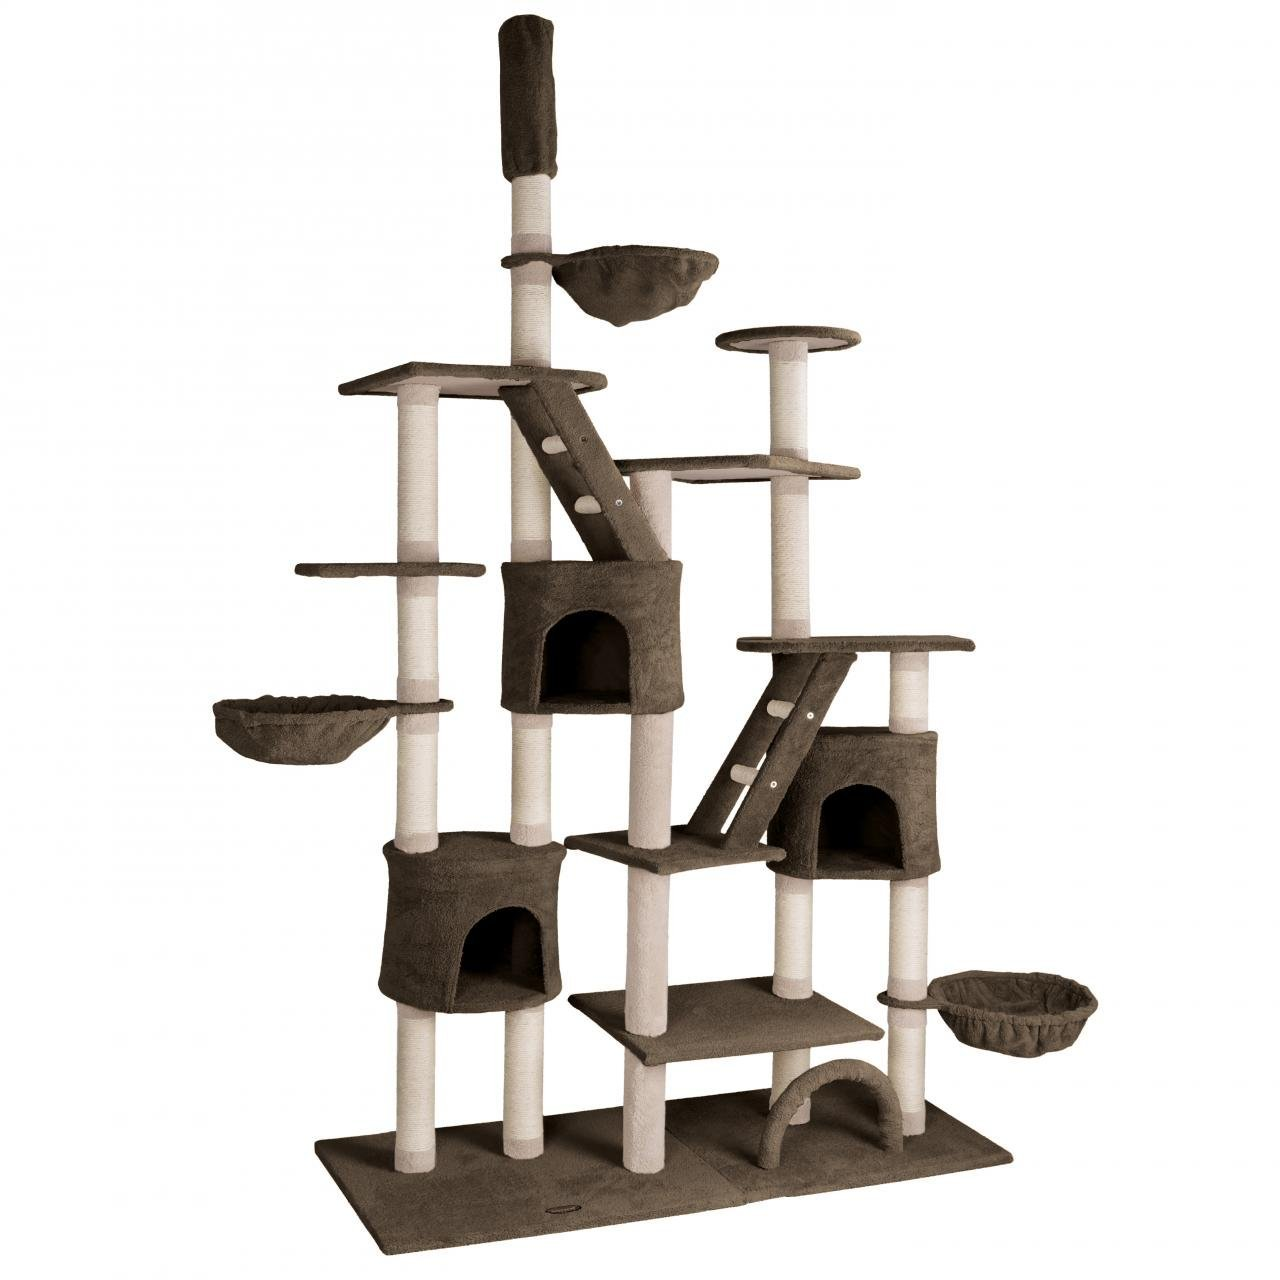 Kočičí škrabadlo XXXL - hnědé 260cm vysoké